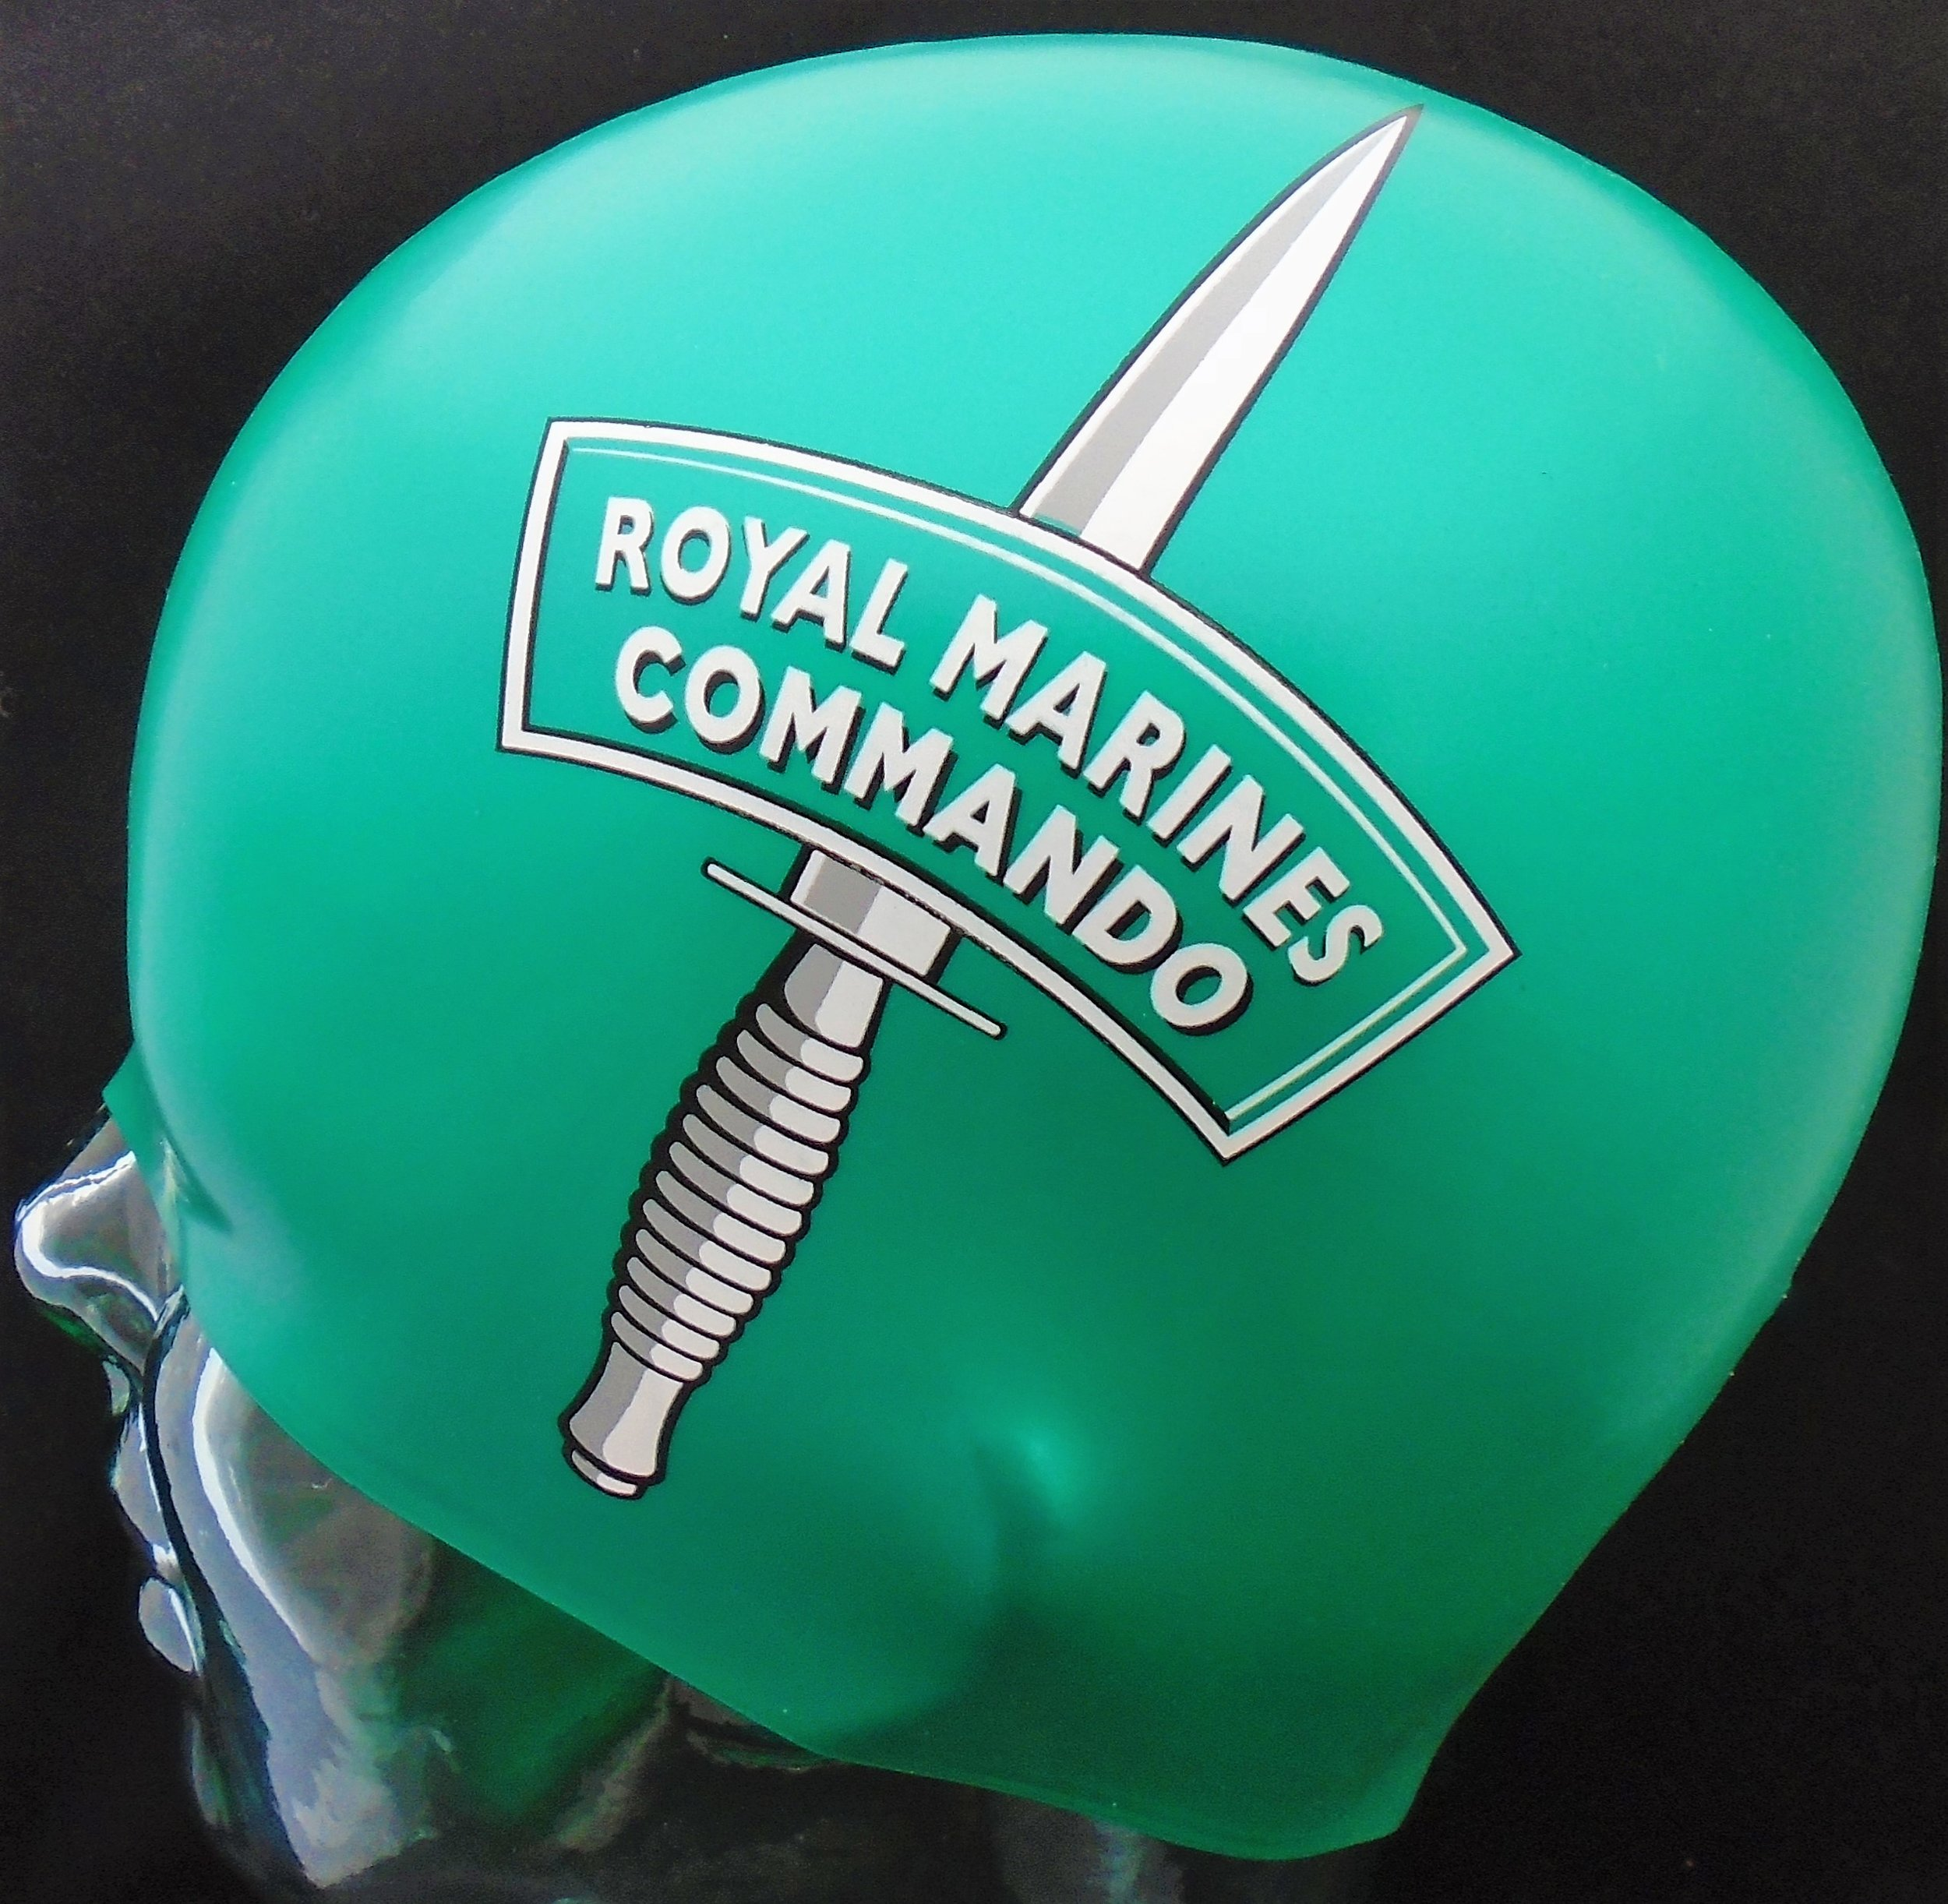 Royal Marines Commando.jpg